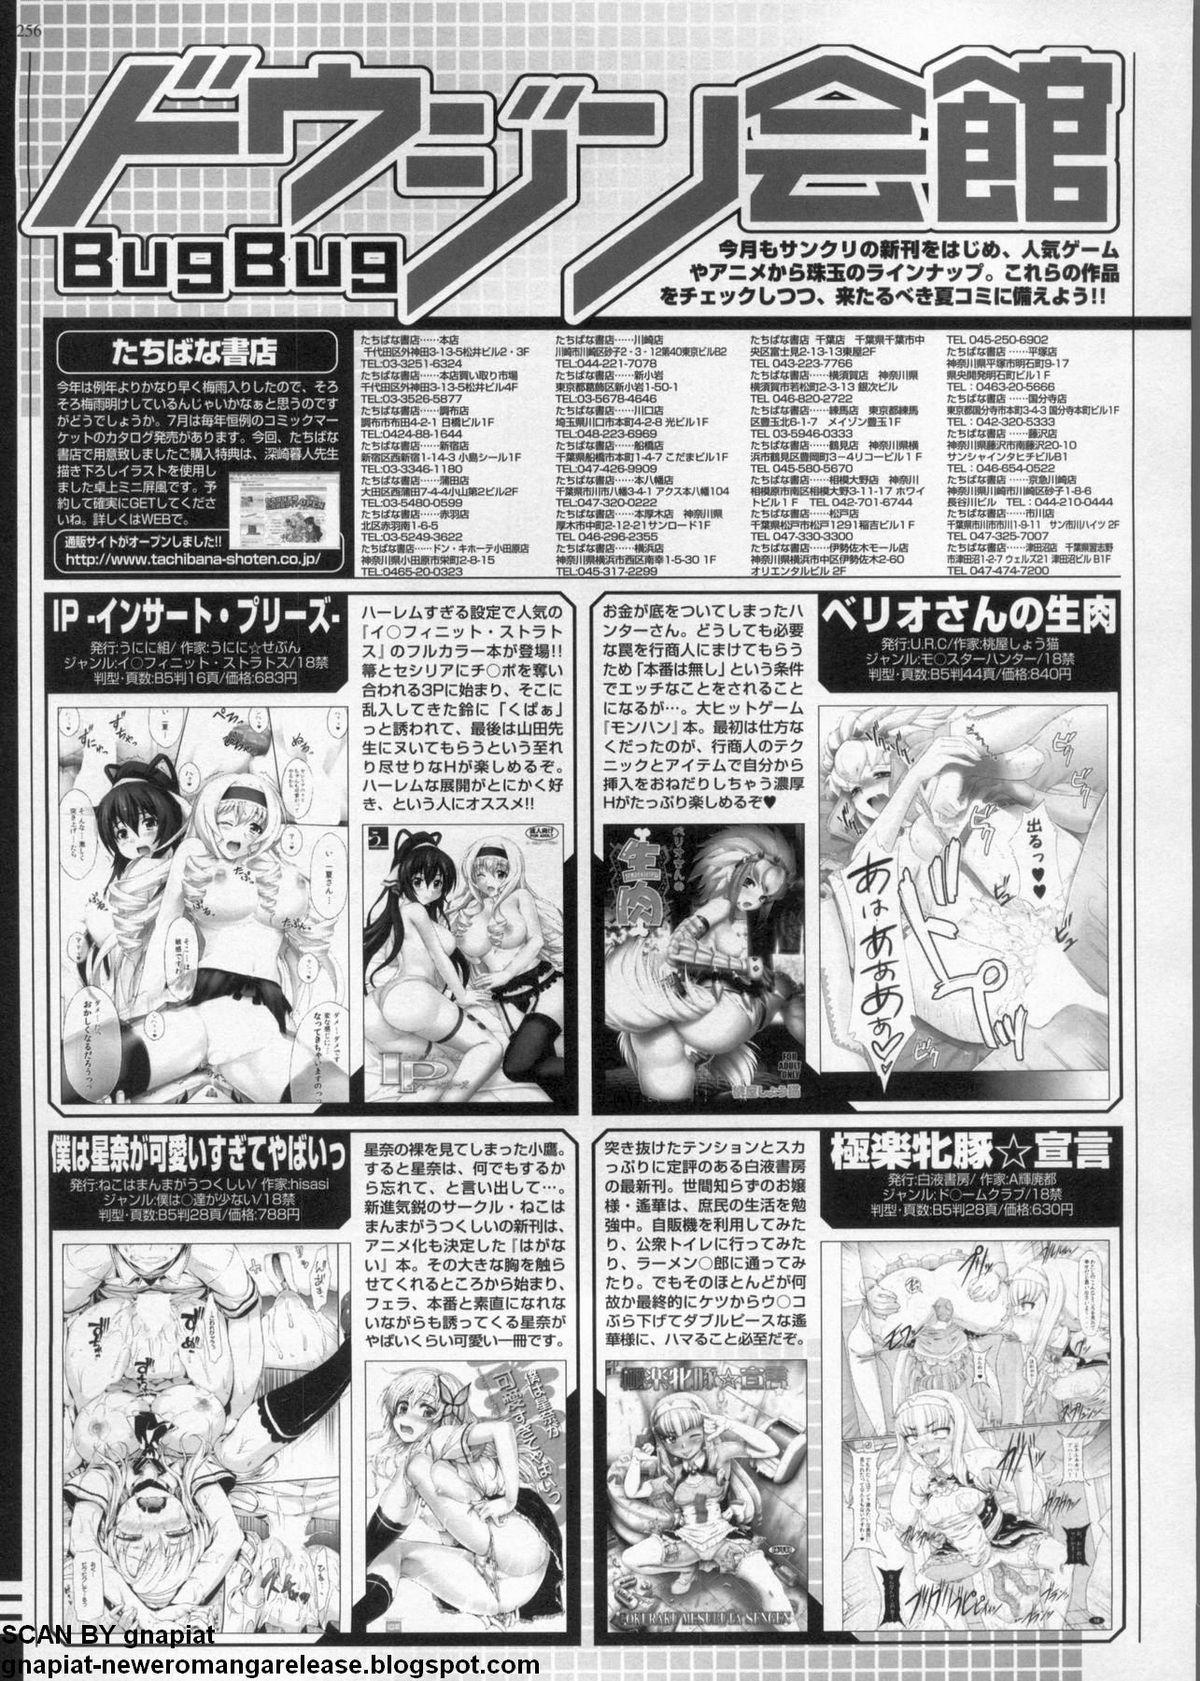 BugBug 2011-08 Vol. 204 253